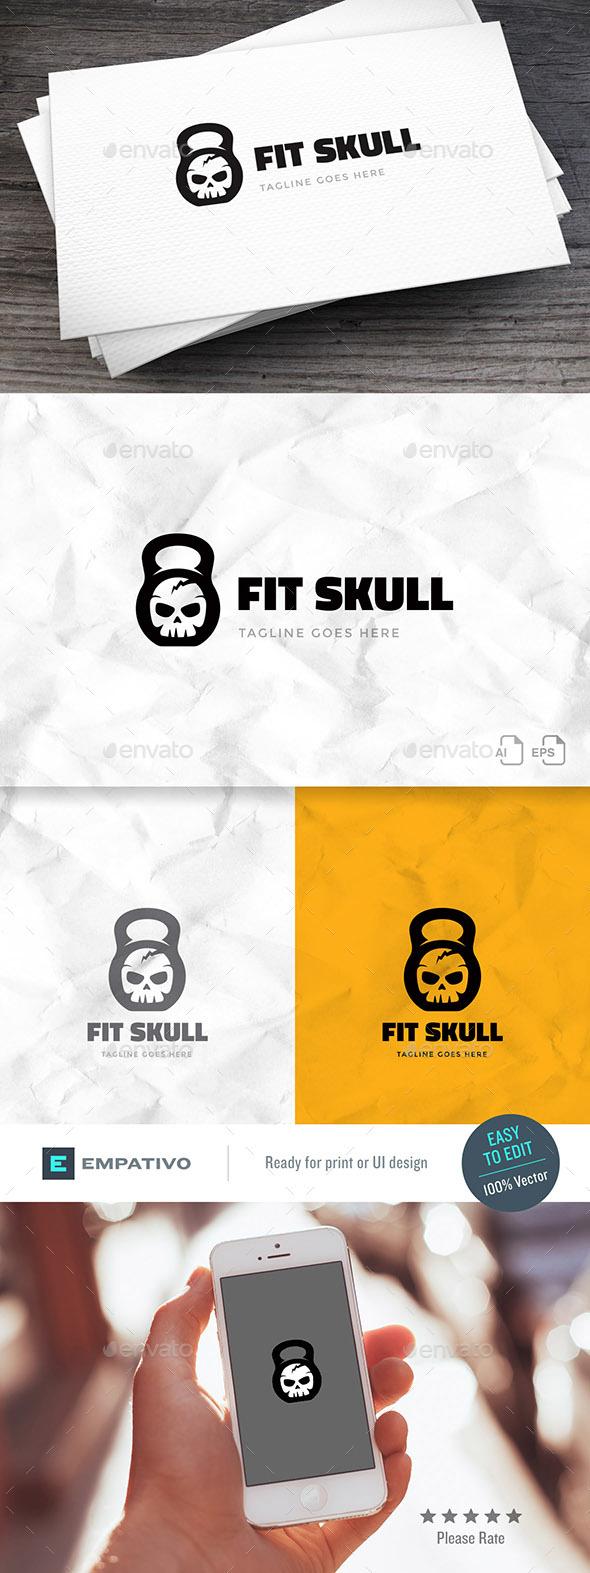 GraphicRiver Fit Skull Logo Template 20320625